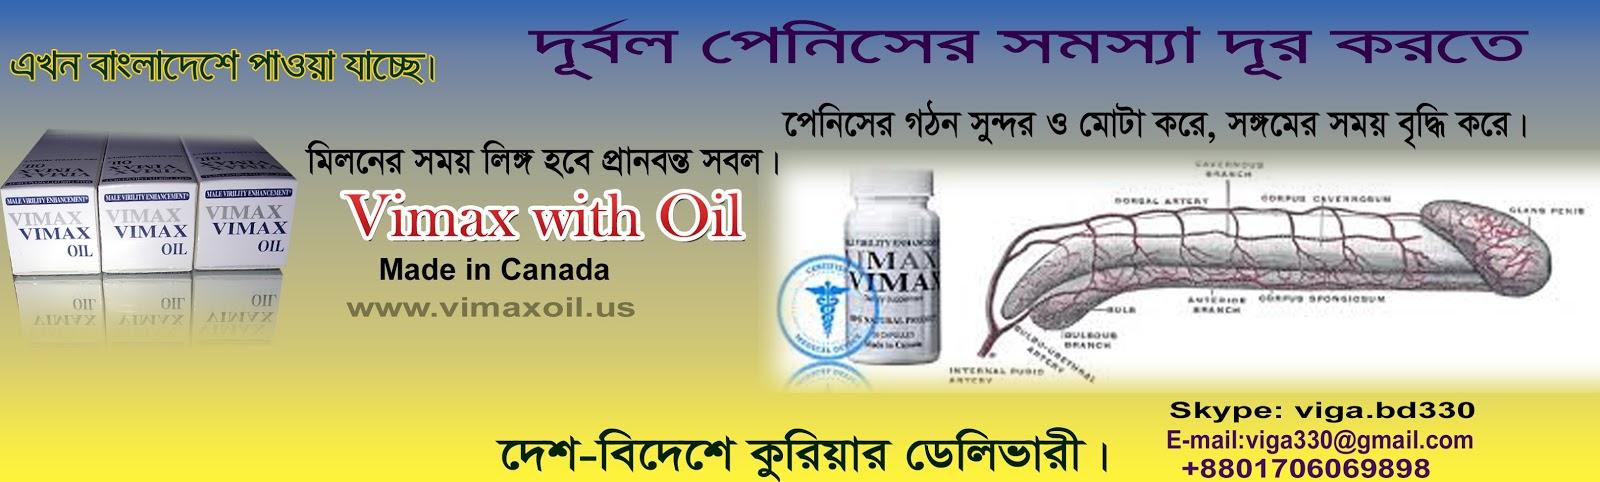 vimax oil k s a 8801706069898